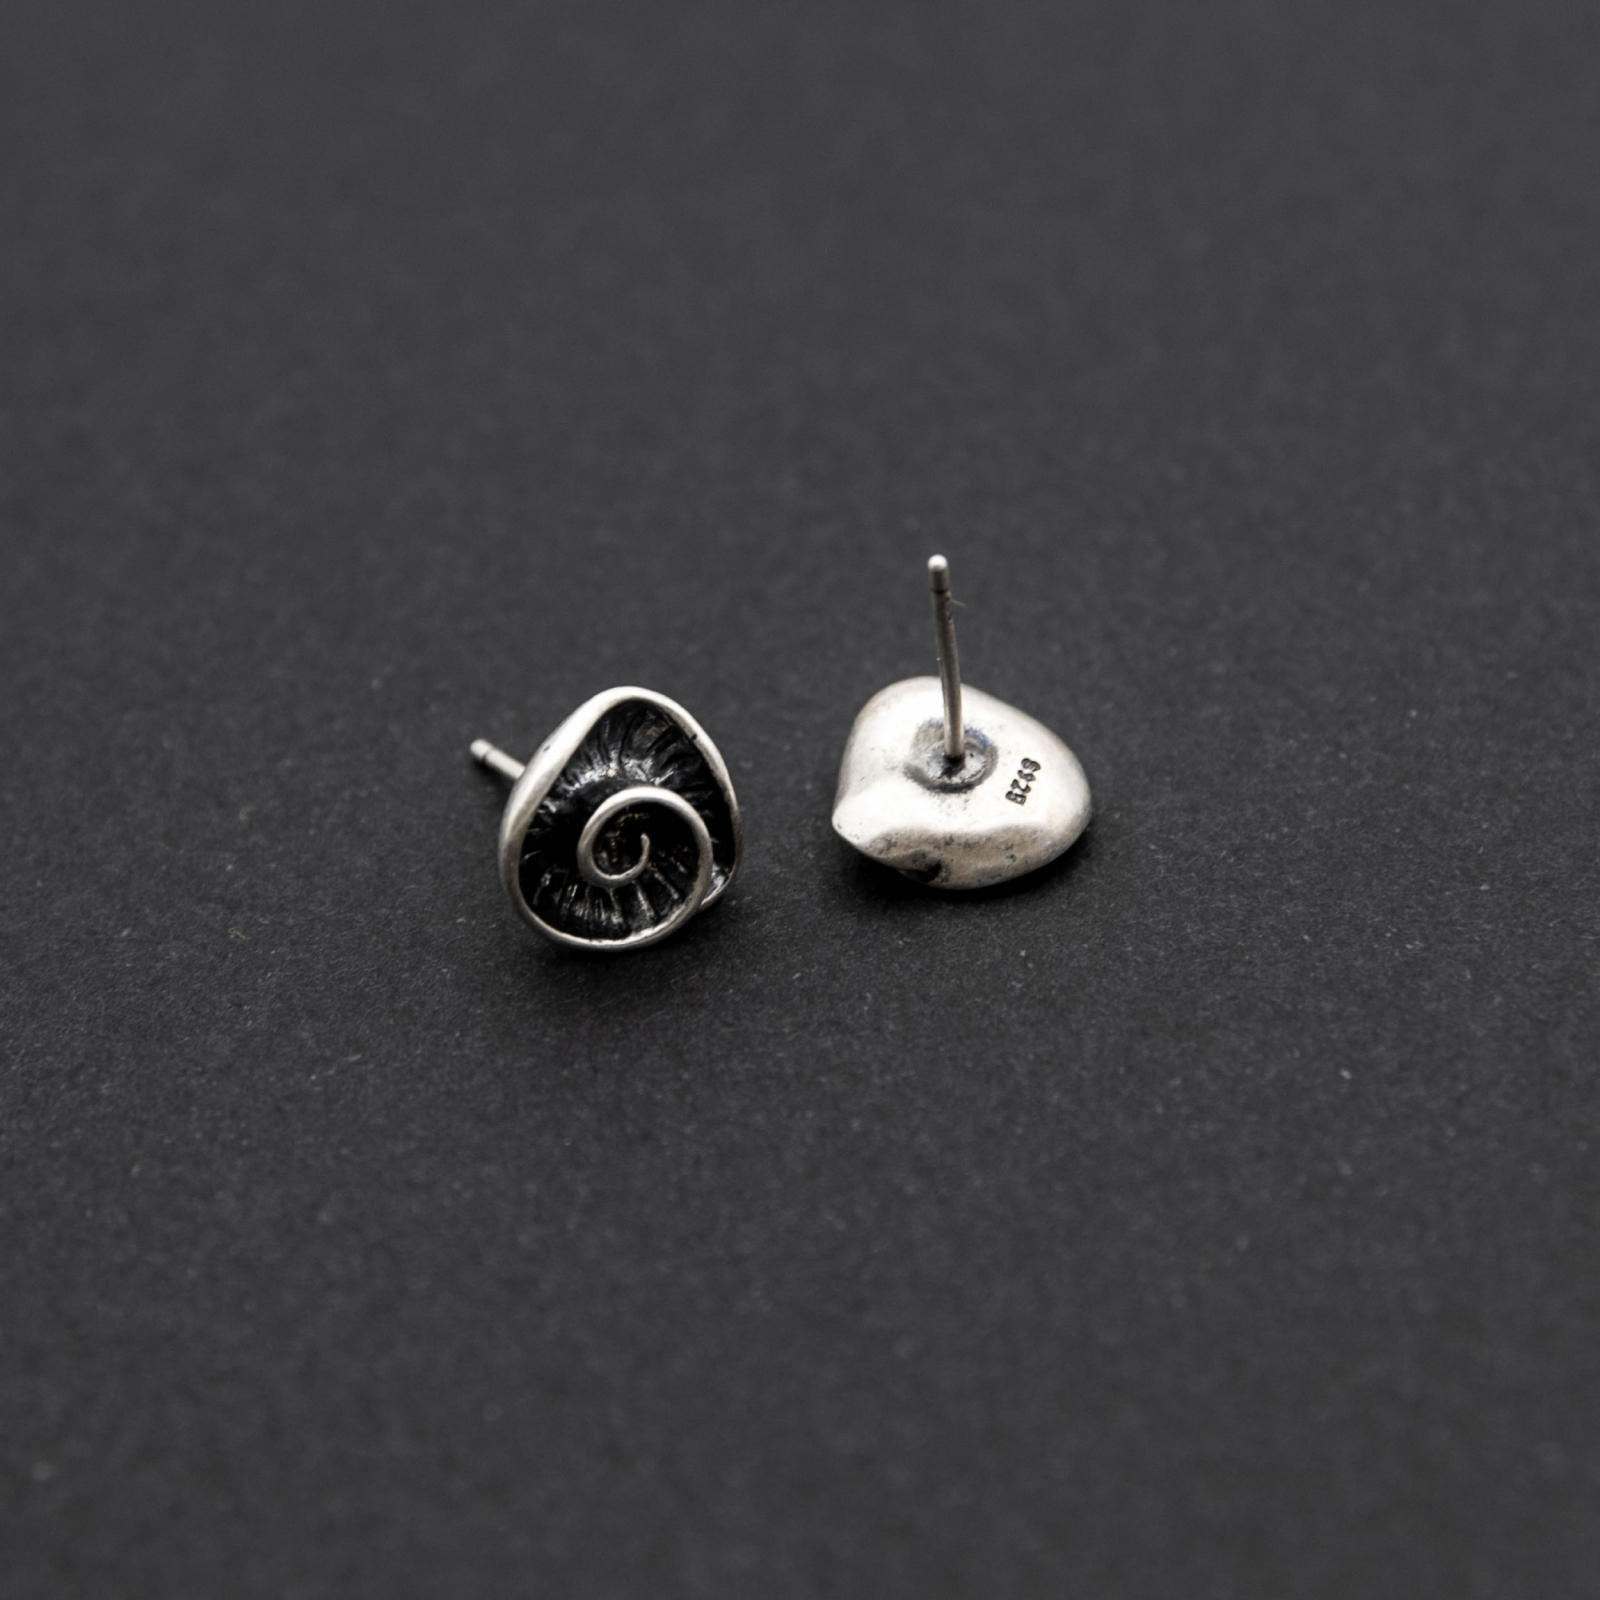 dating semne de argint sterlină)